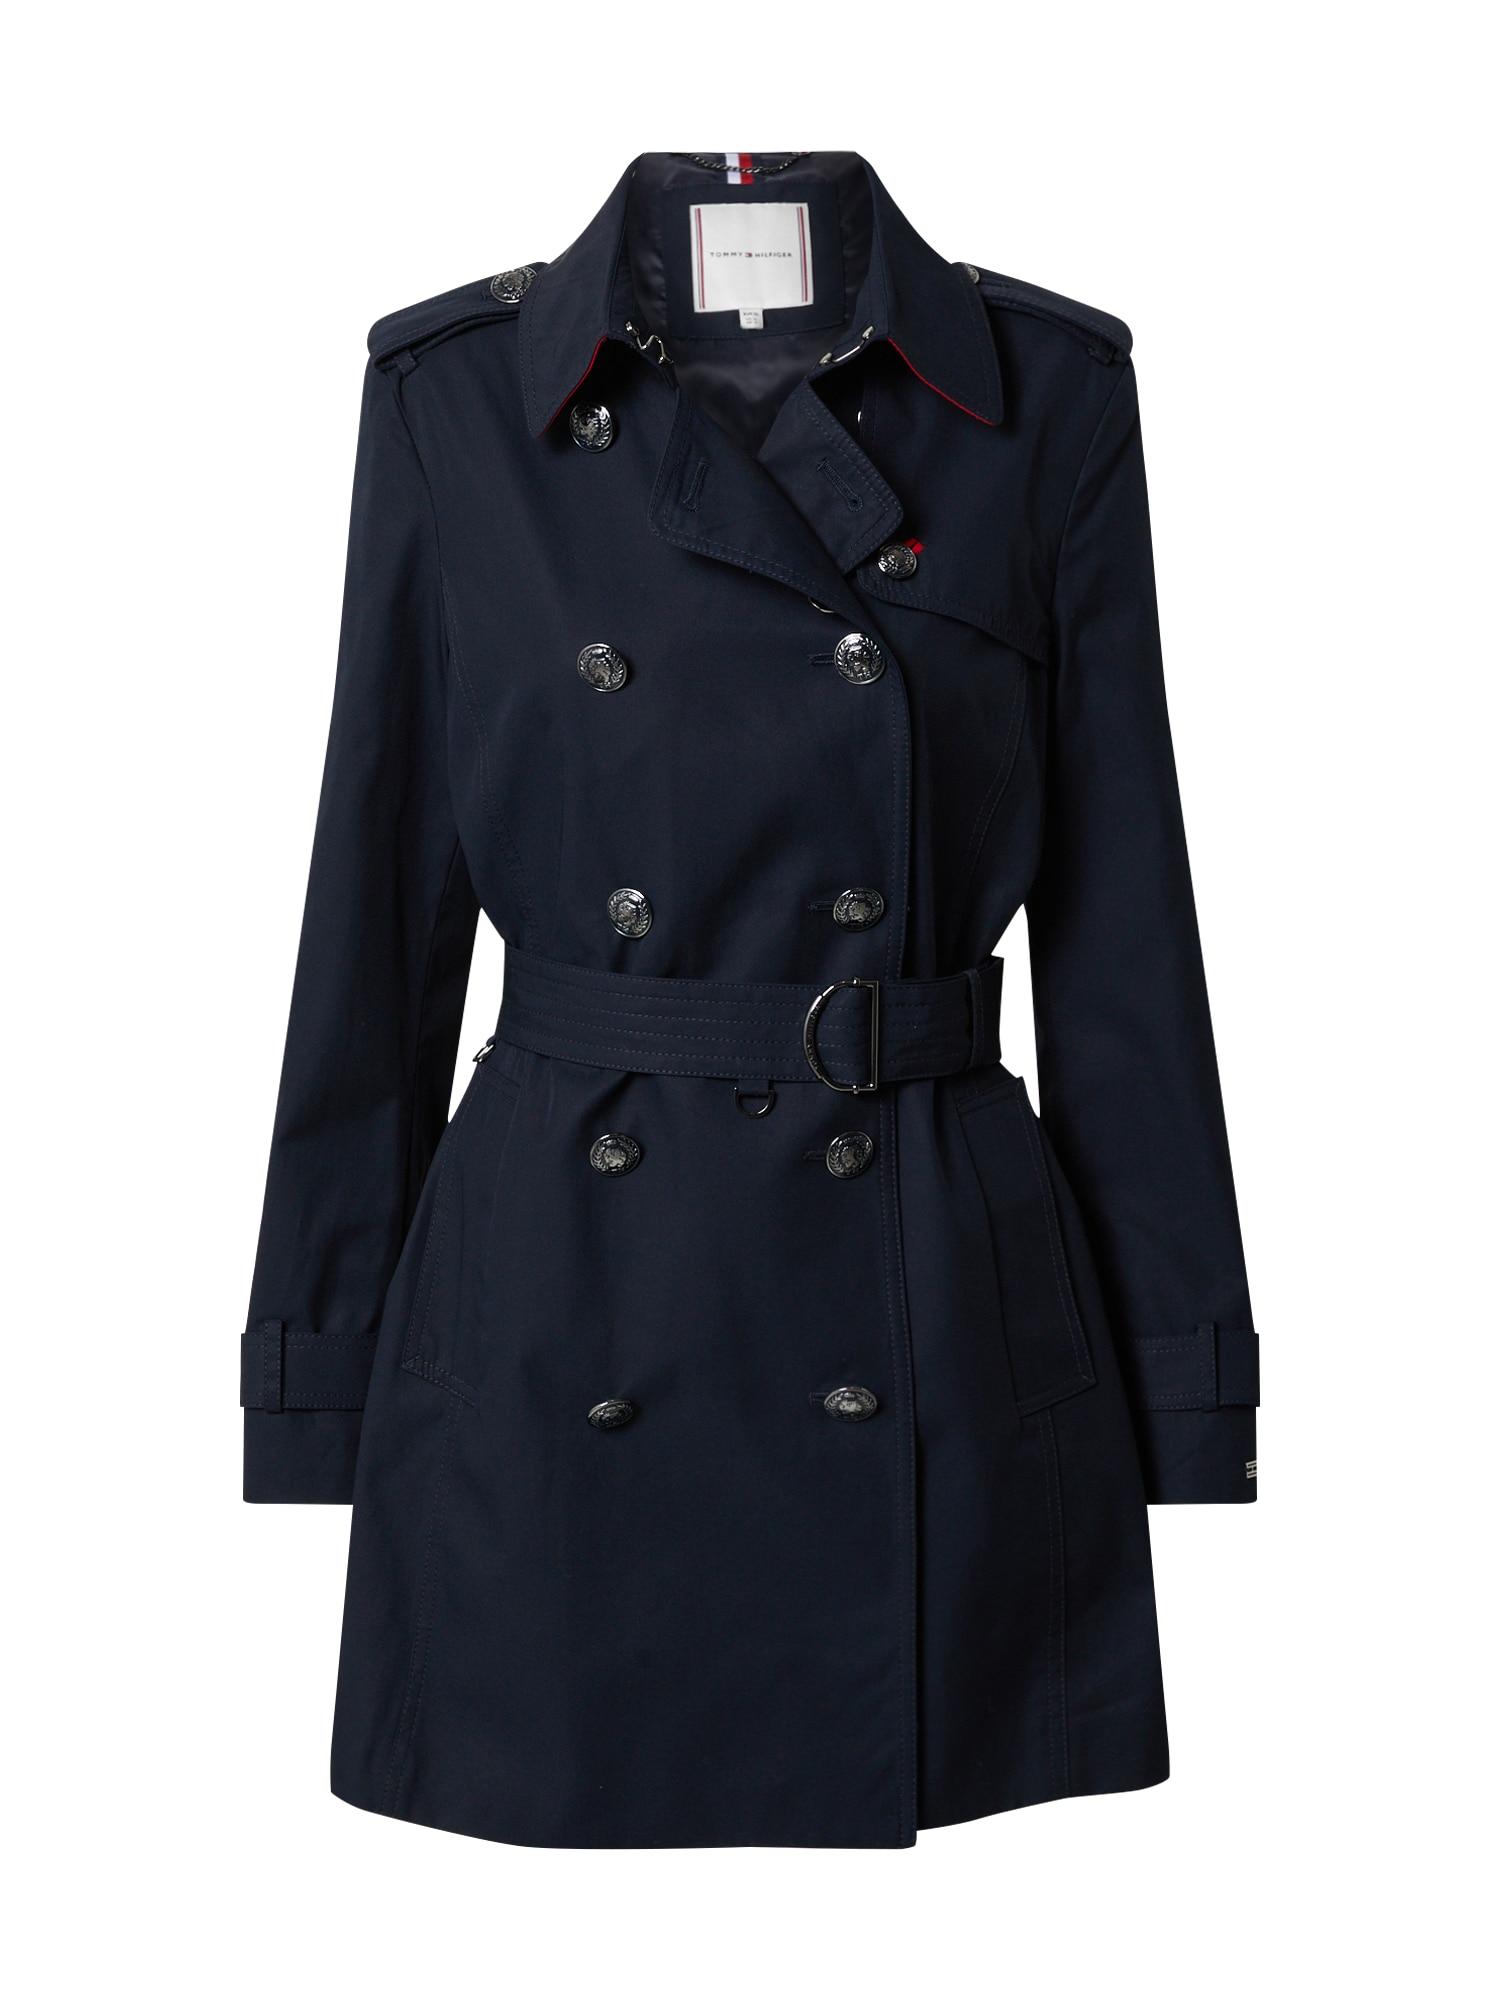 TOMMY HILFIGER Rudeninis-žieminis paltas 'MEGAN' tamsiai mėlyna